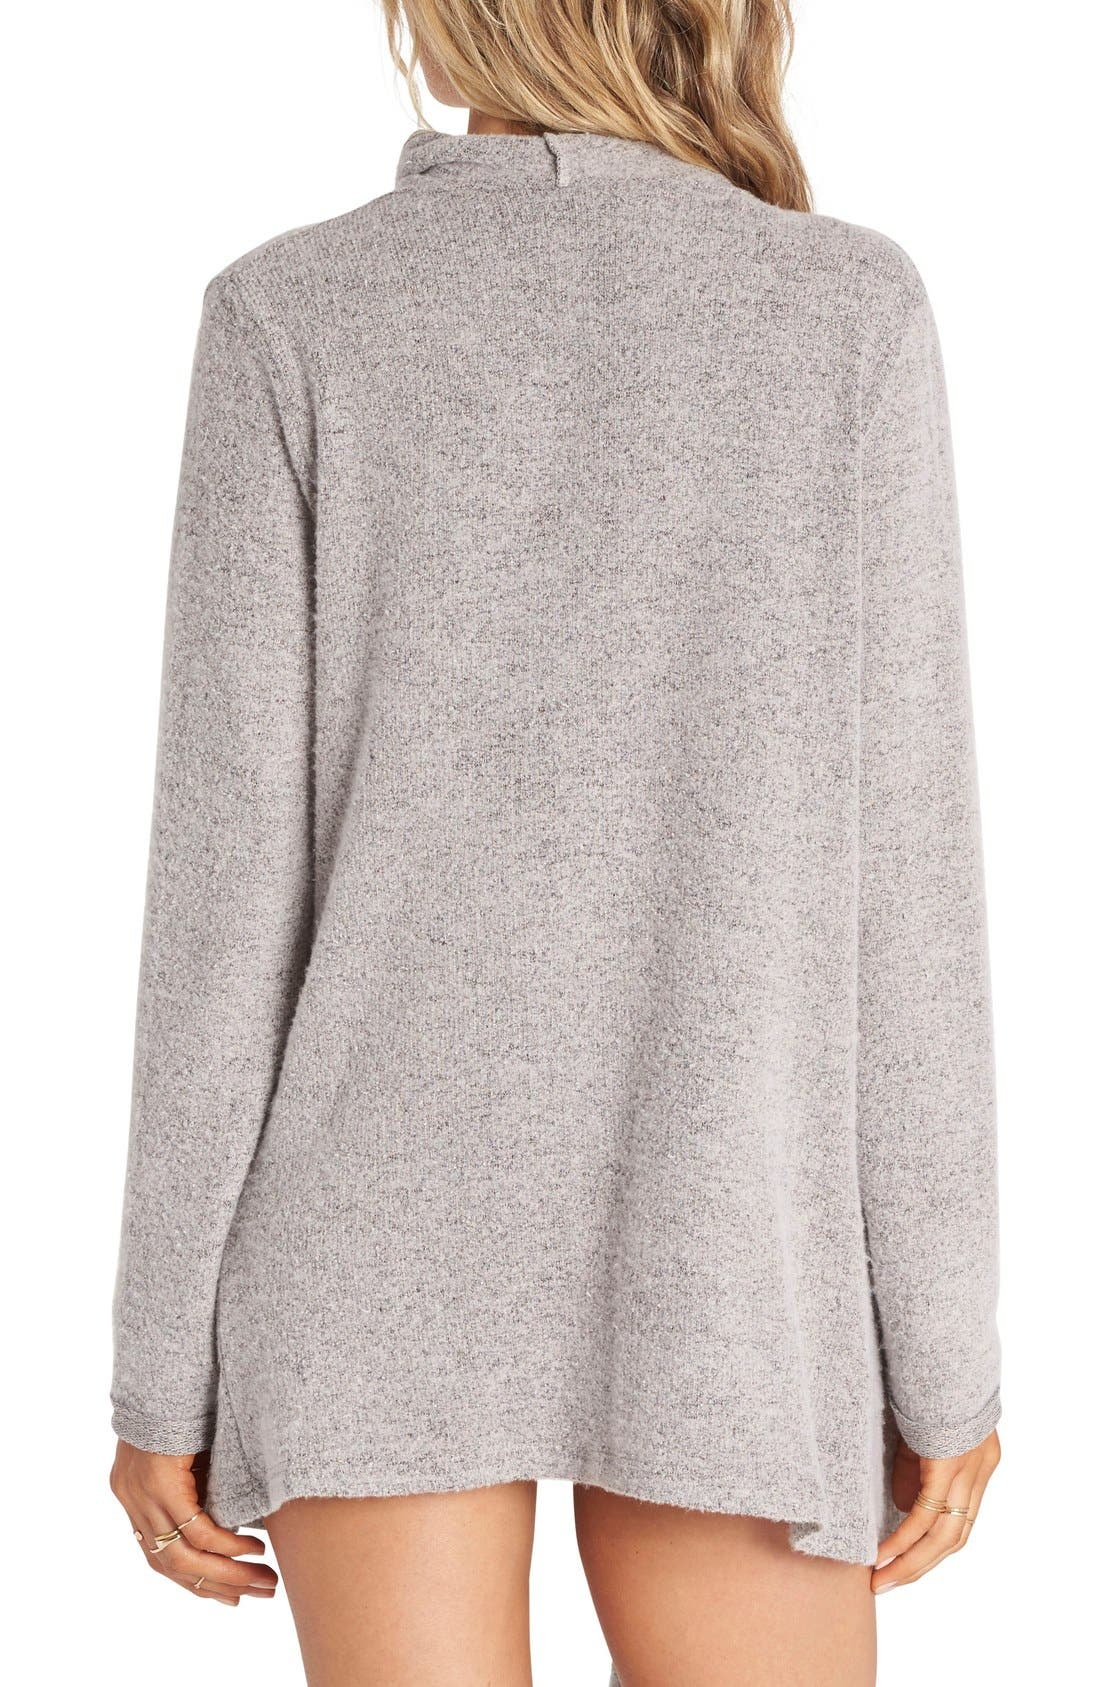 Alternate Image 2  - Billabong Make A Bet Knit Cardigan